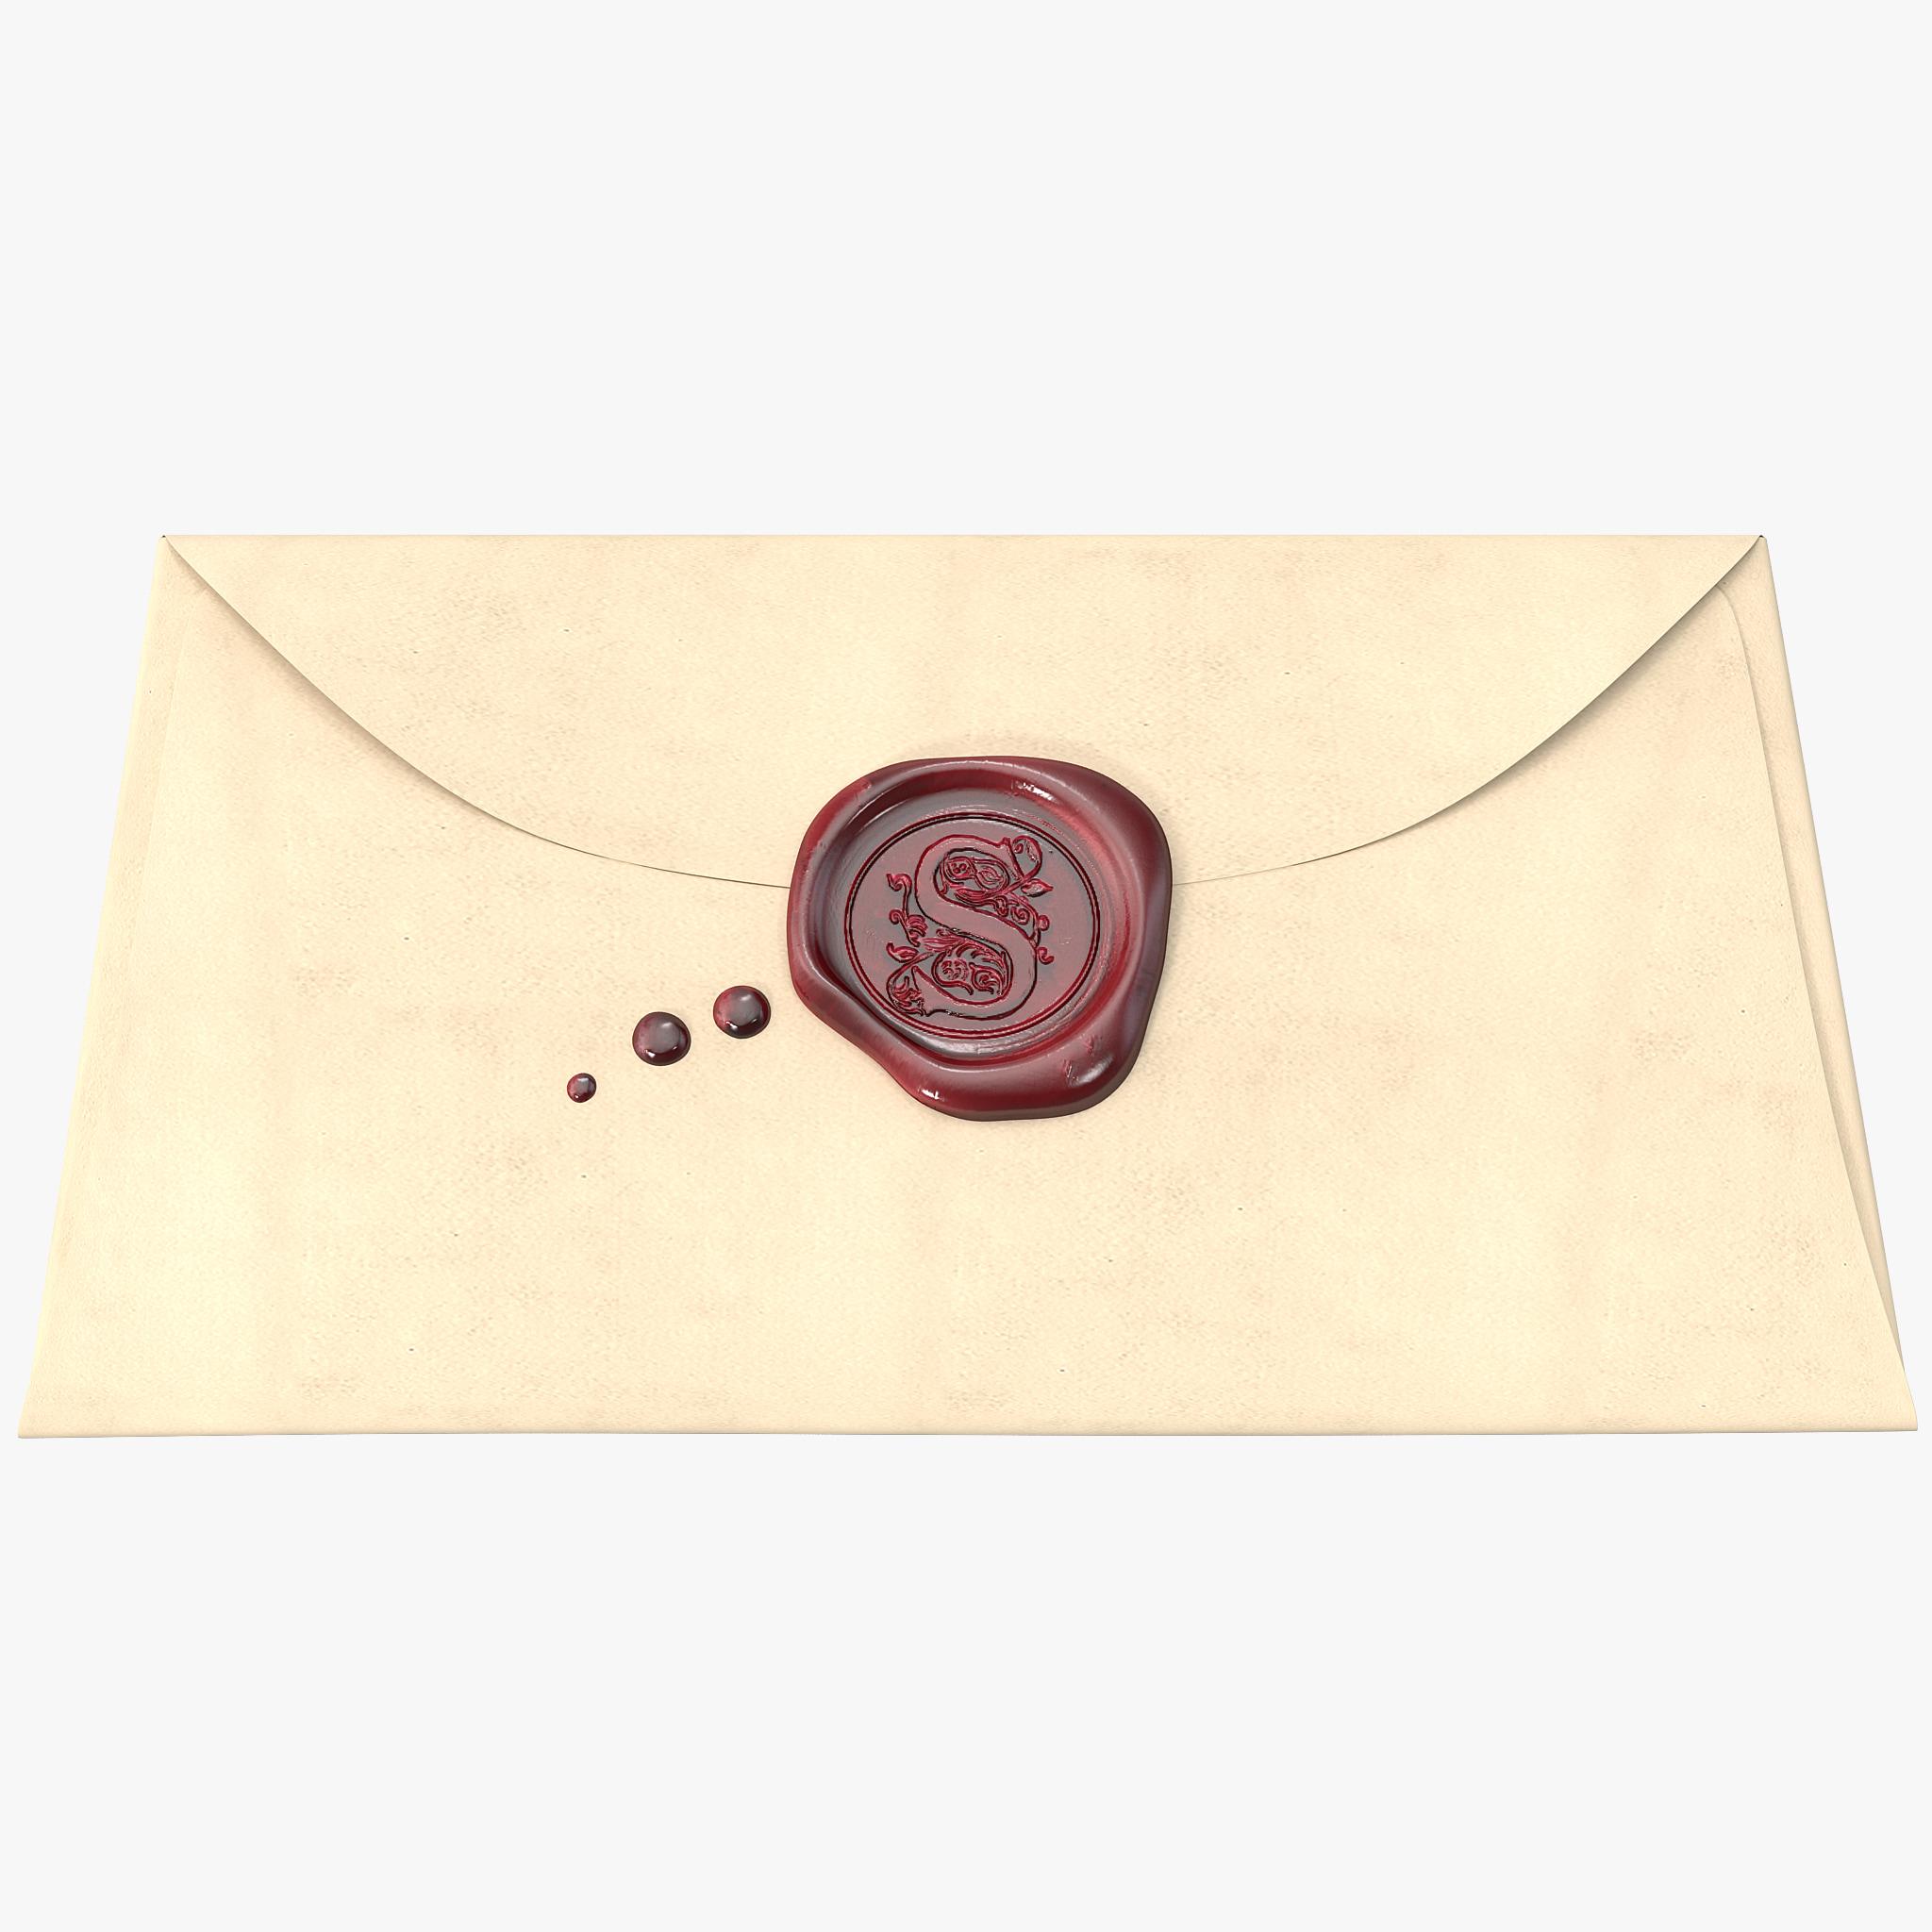 Envelope With Wax Seal_1.jpg